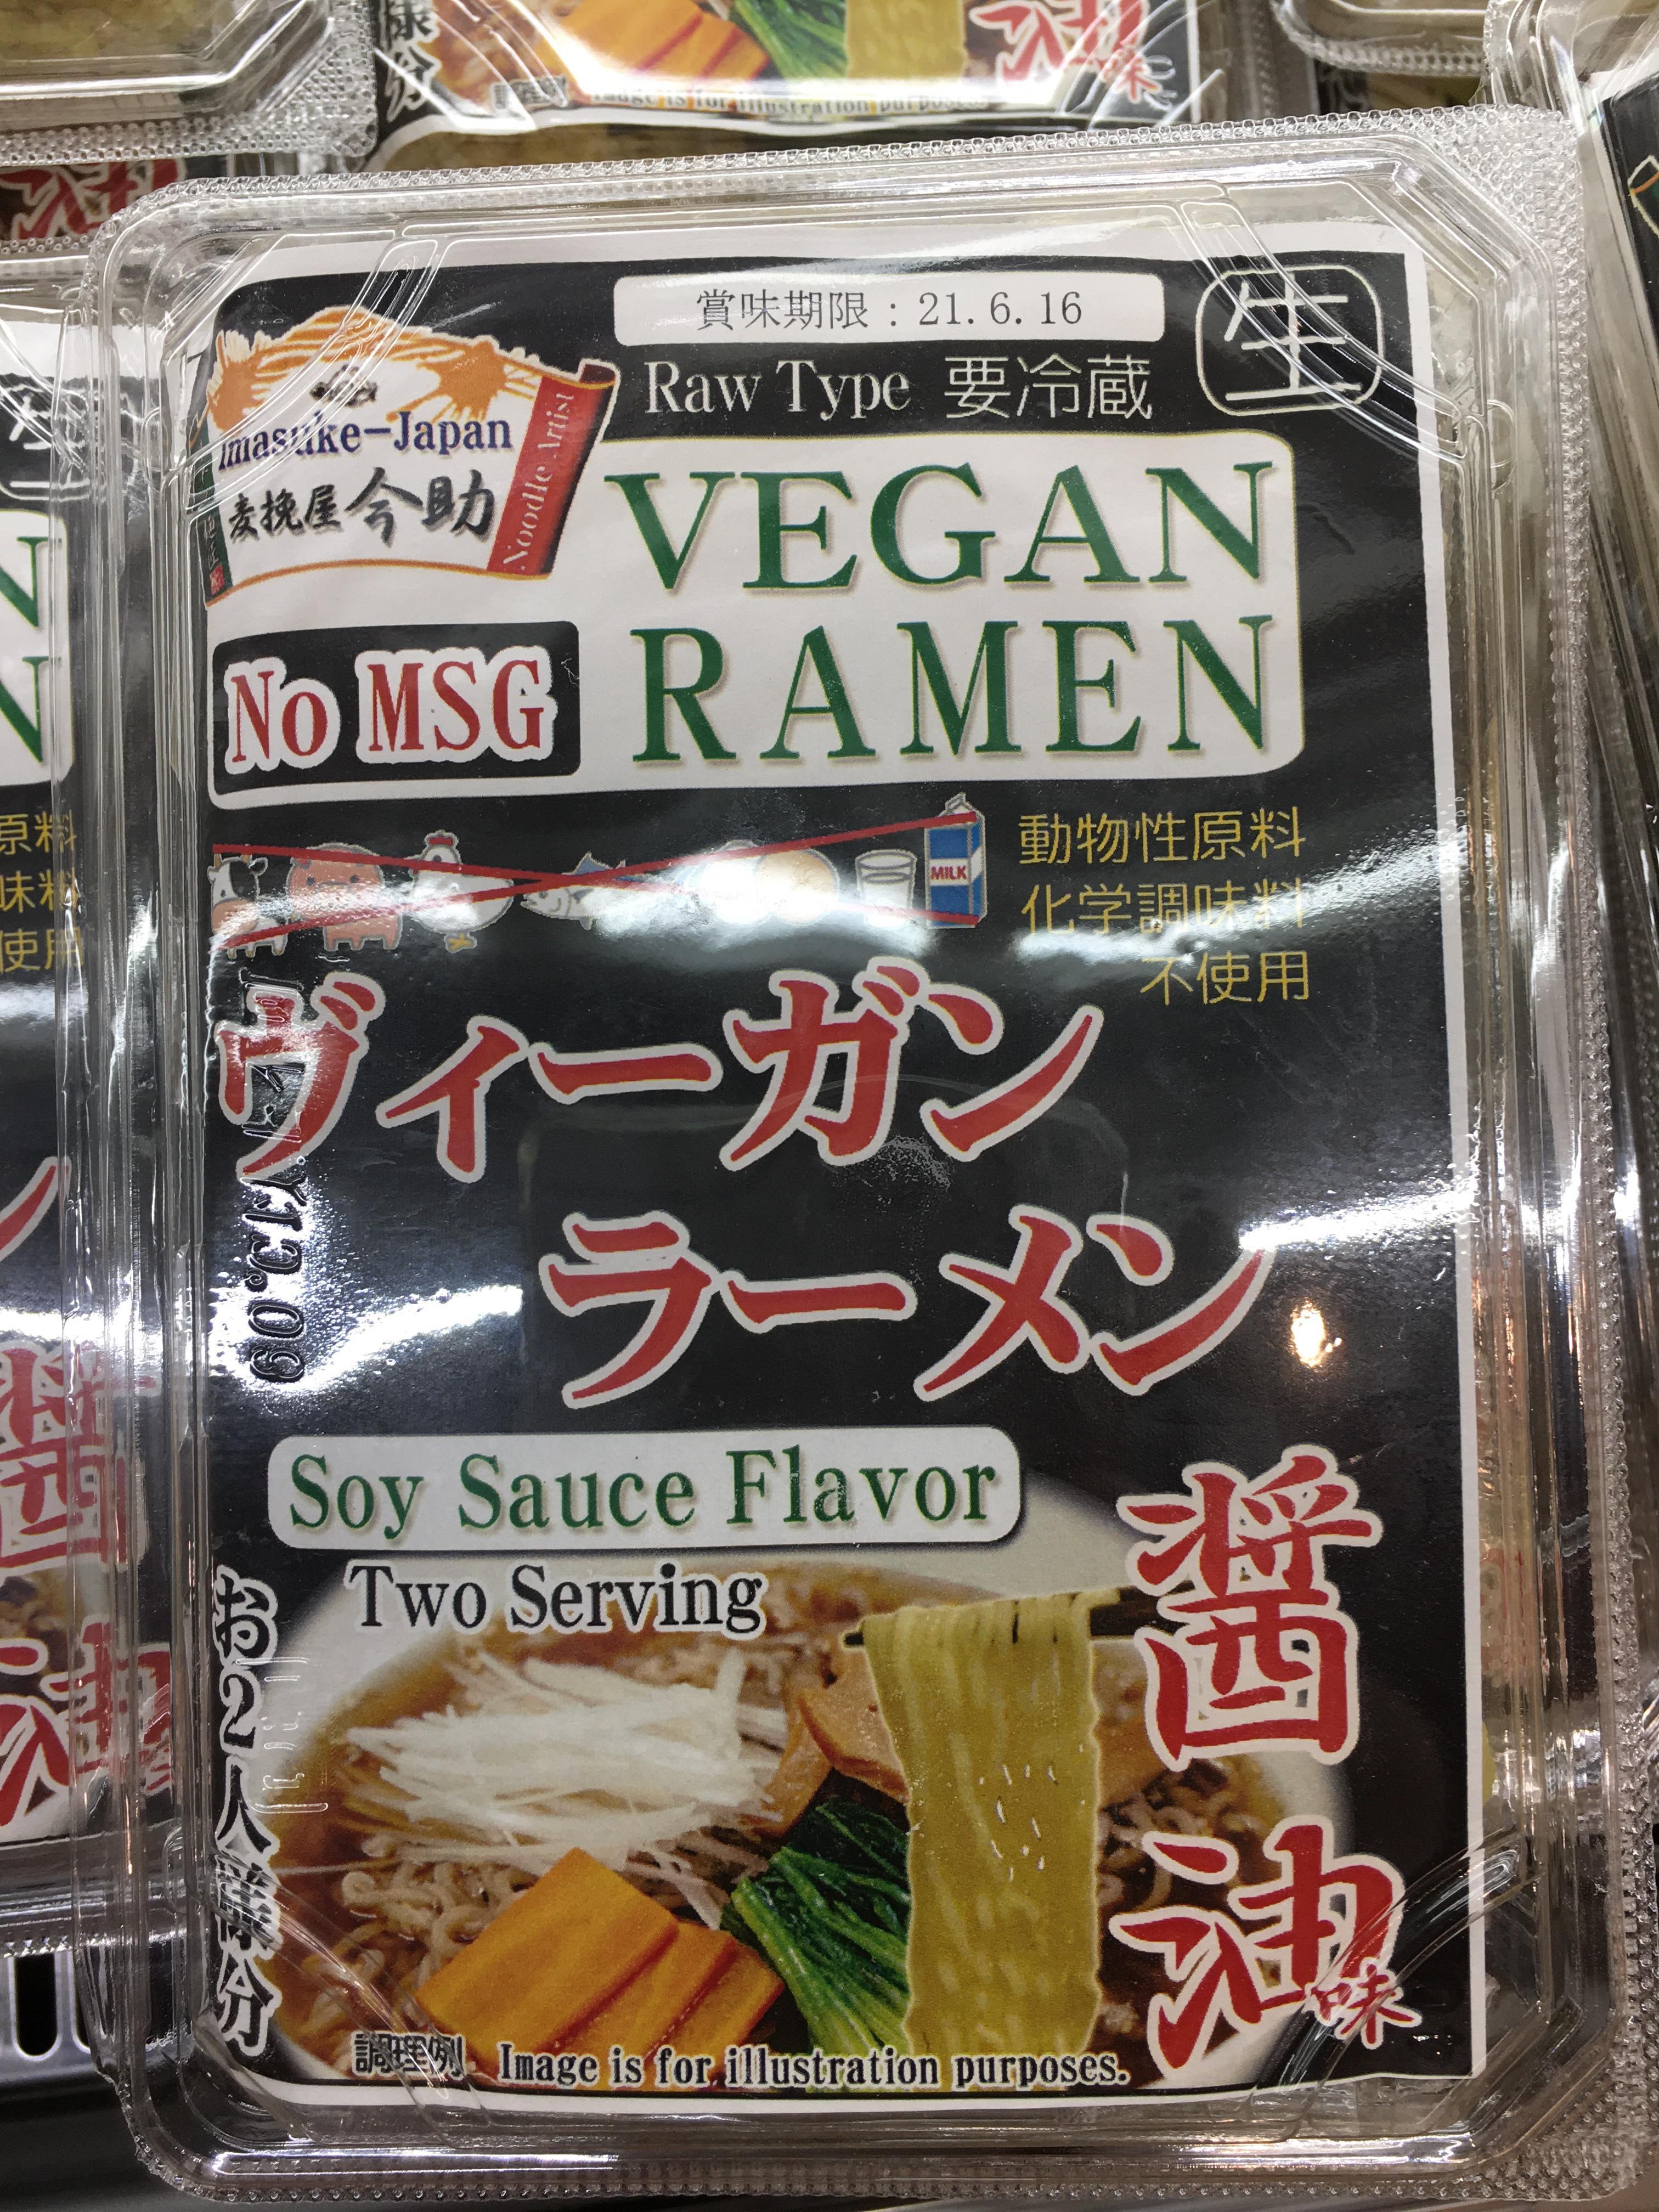 Imasuke Japan Raw Type Vegan Ramen Soy Sauce Flavor